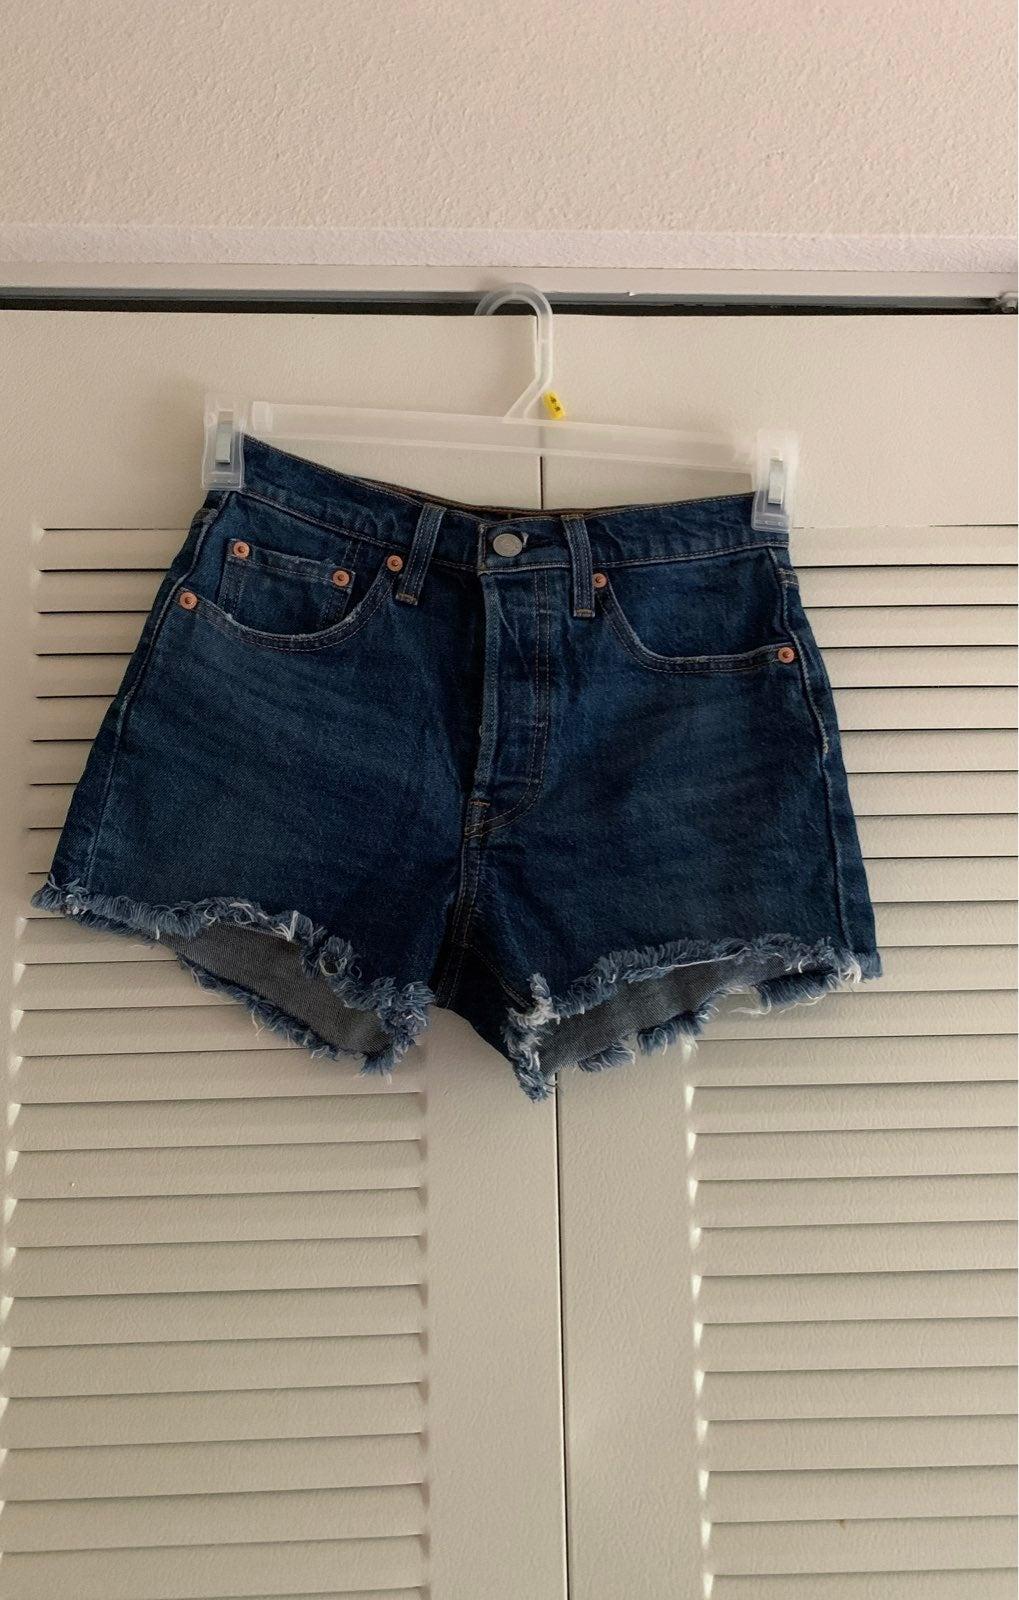 Levi's 501 dark wash denim Shorts